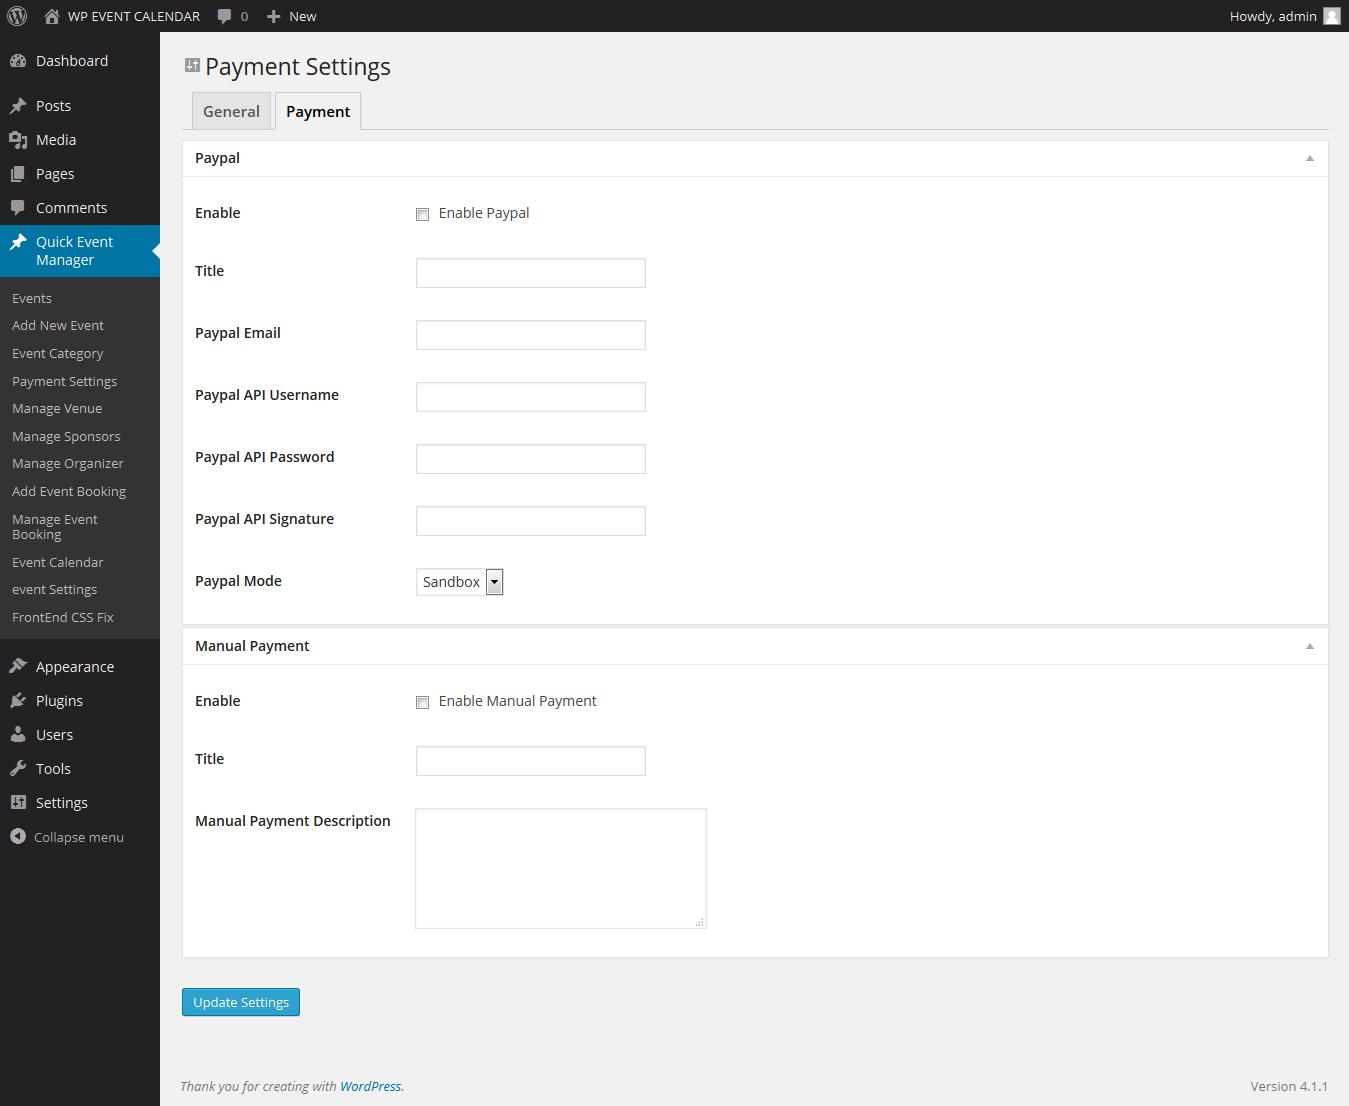 EventCommerce WP Responsive Event Calendar Pro